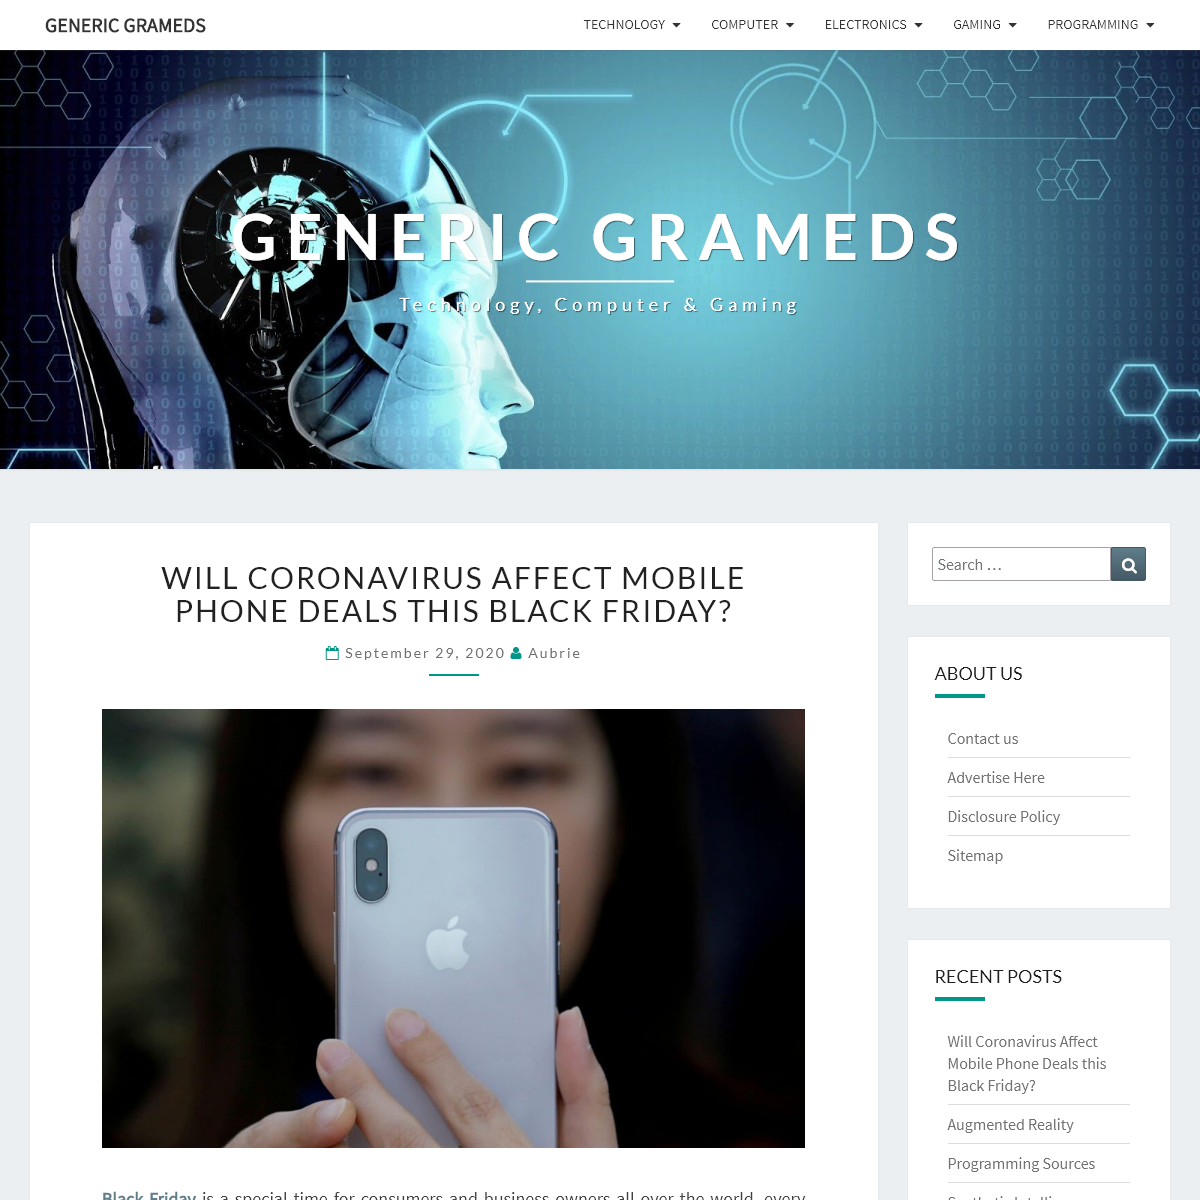 generic grameds - Technology, Computer & Gaming